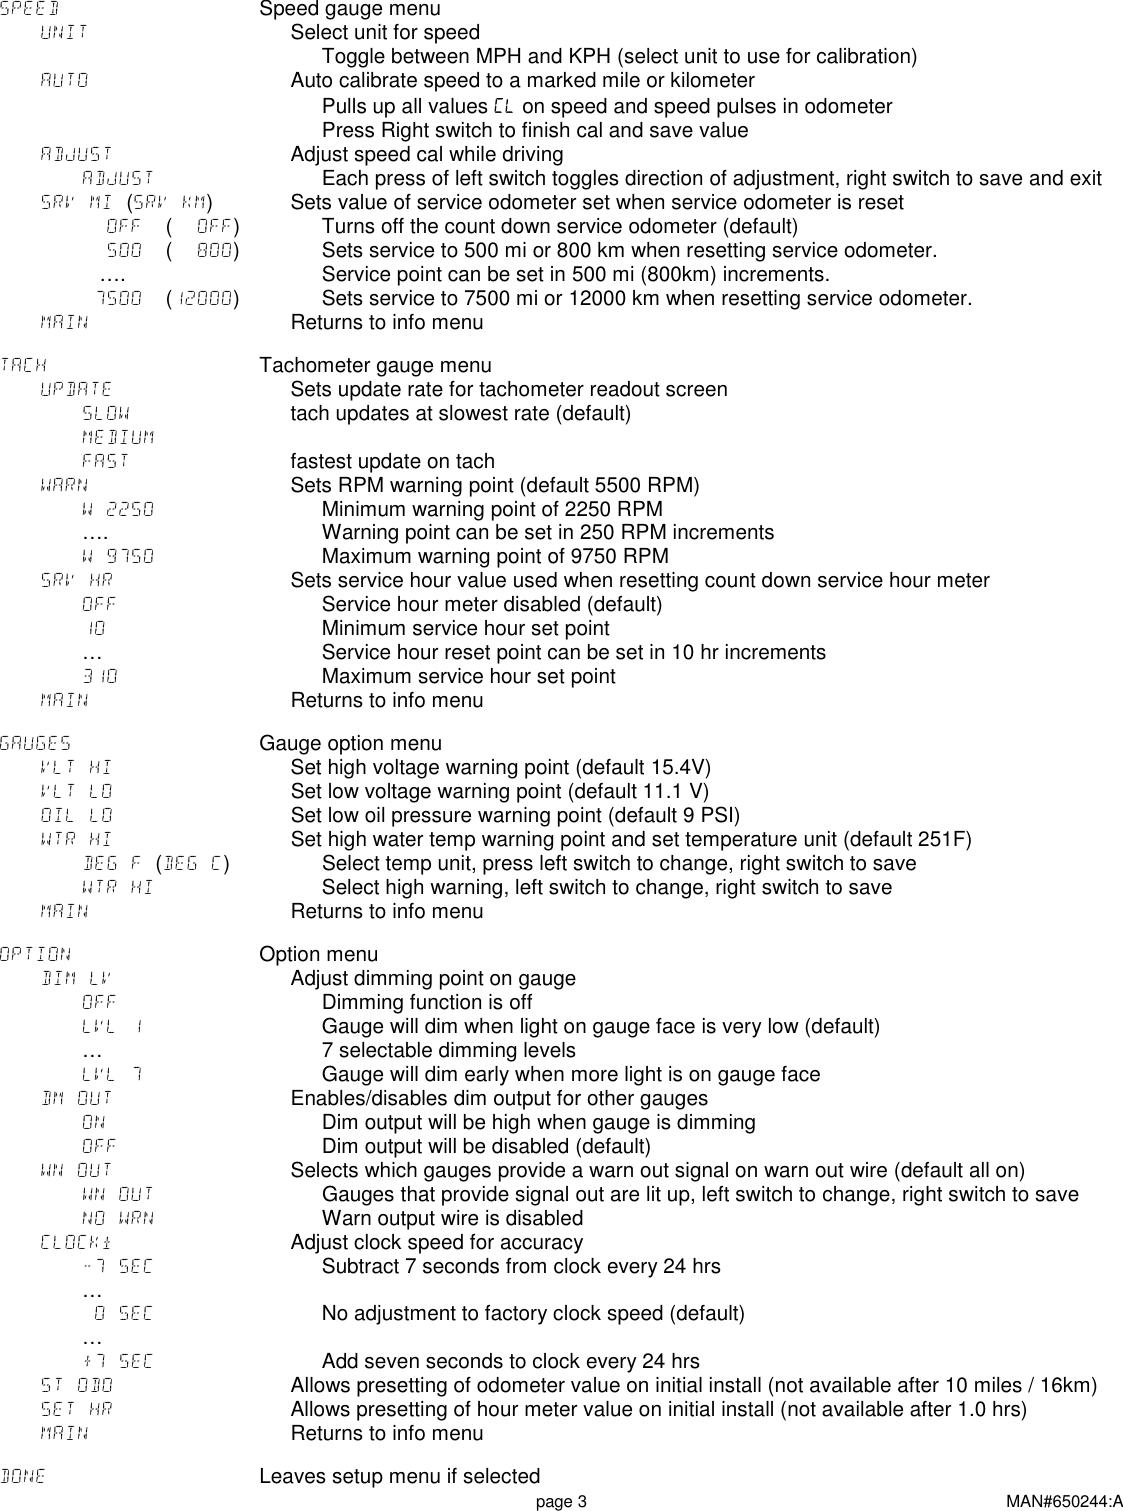 Page 3 of 6 - Dakota-Digital Dakota-Digital-Multi-Gauge-Utv-1200-Users-Manual-  Dakota-digital-multi-gauge-utv-1200-users-manual